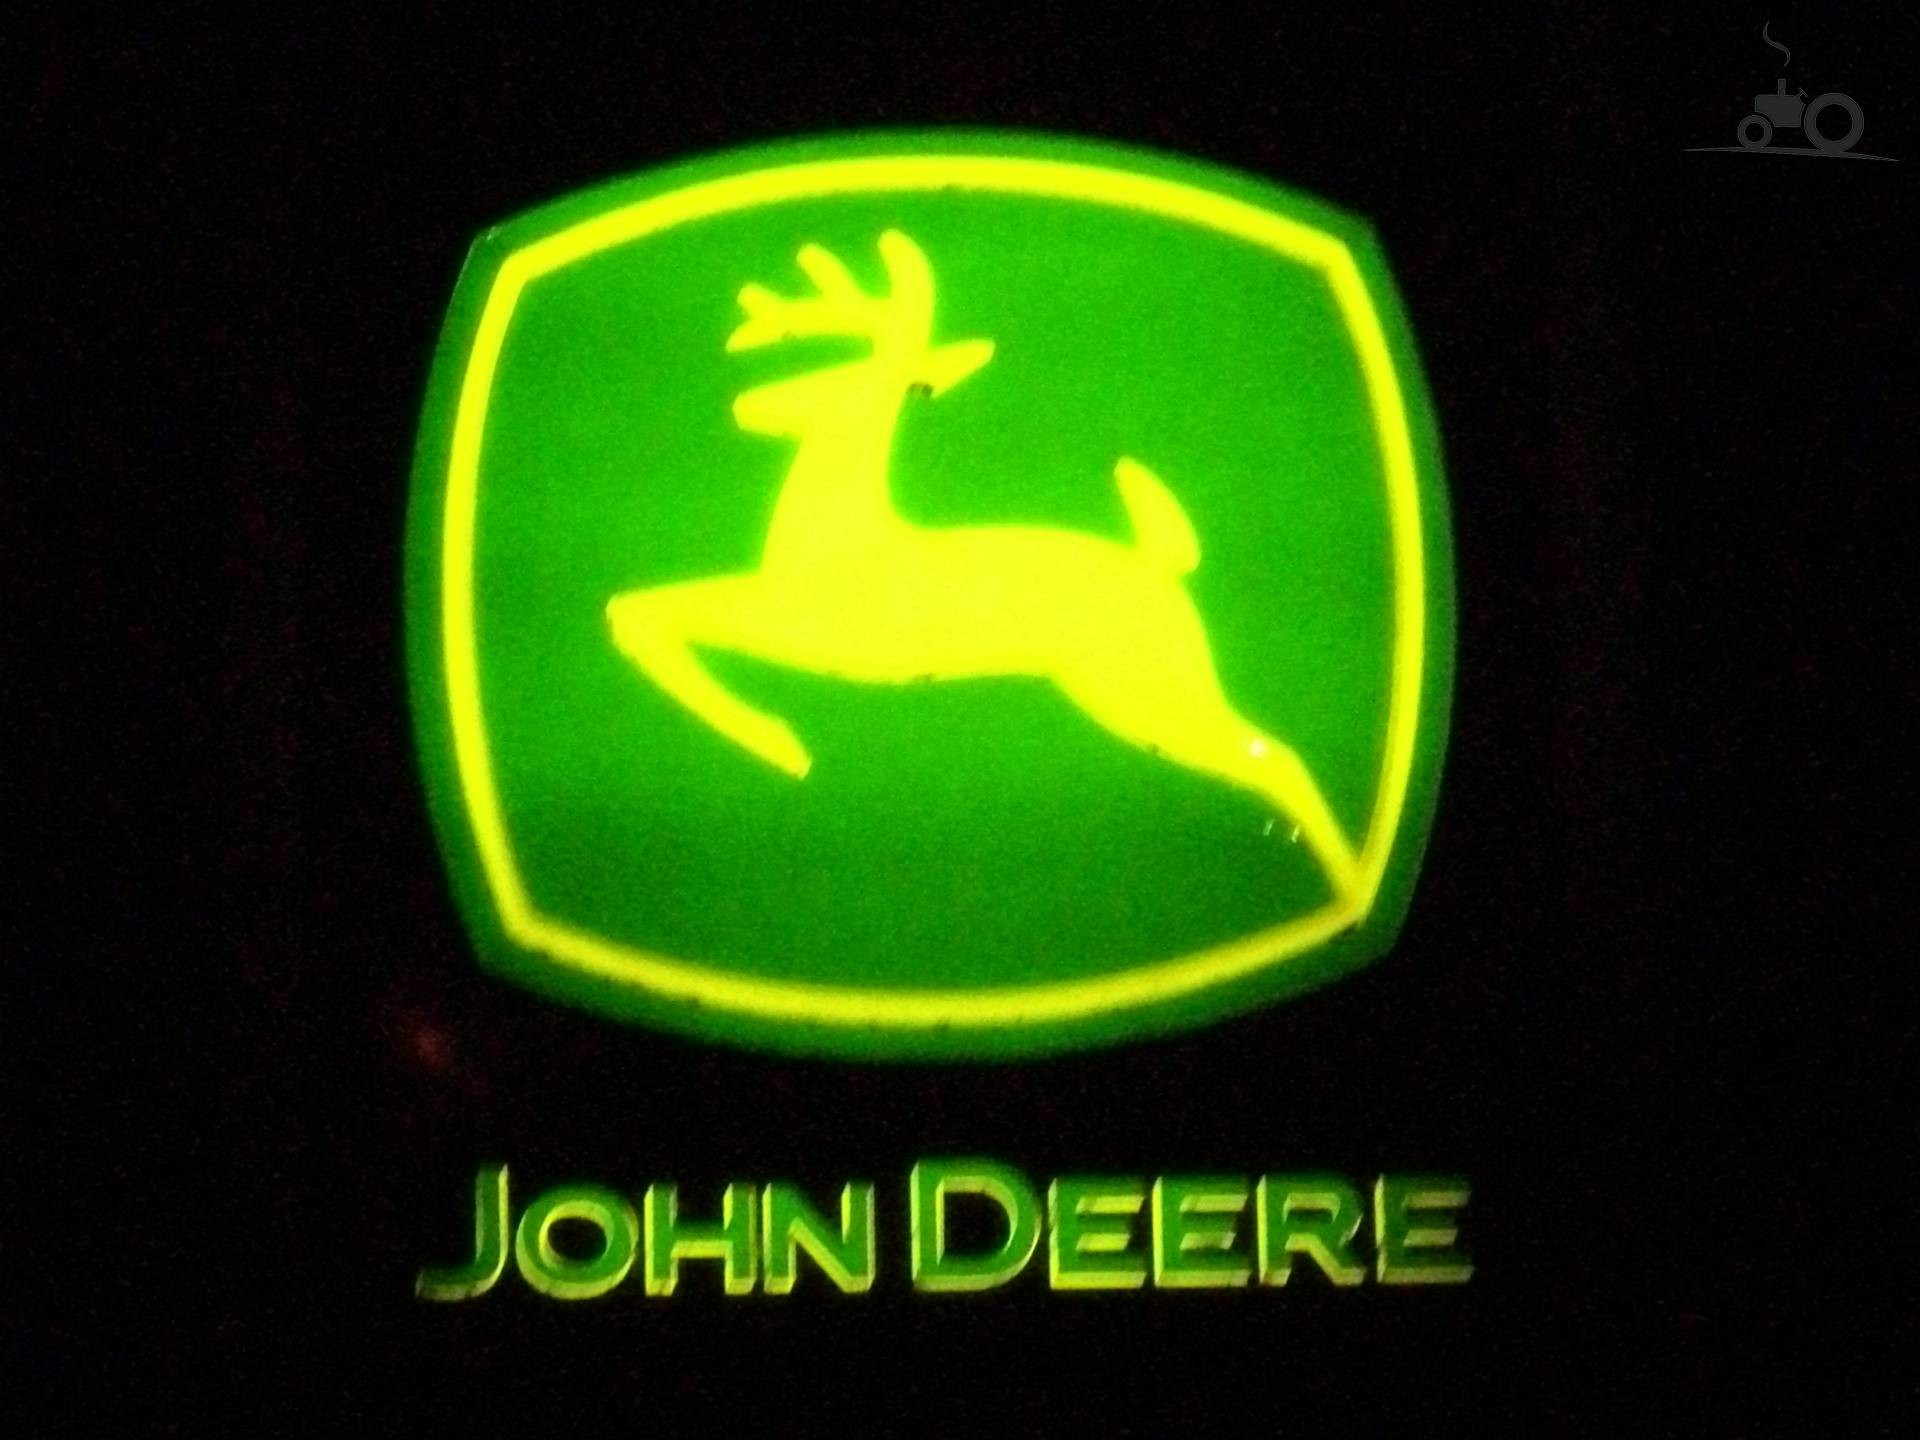 1920x1440 John Deere Emblem - John Deere Store